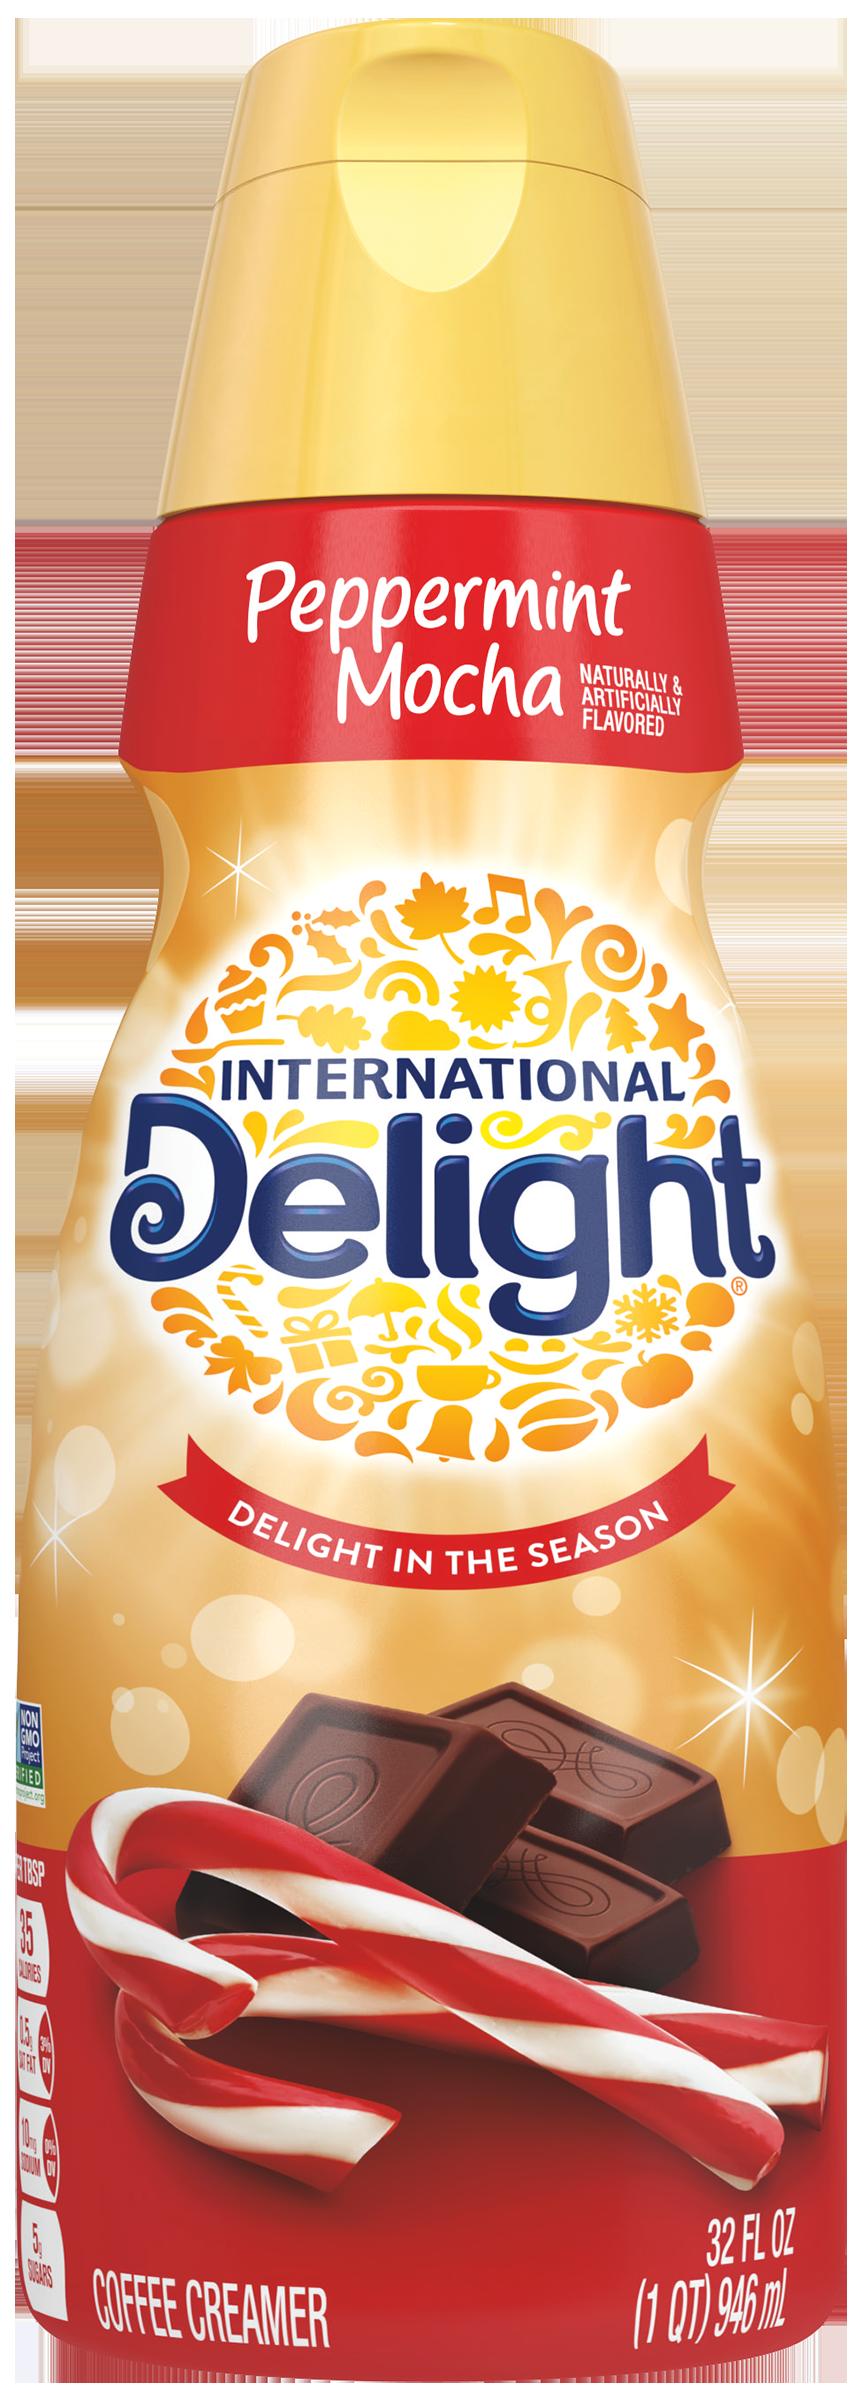 international-delight-peppermint-mocha.png